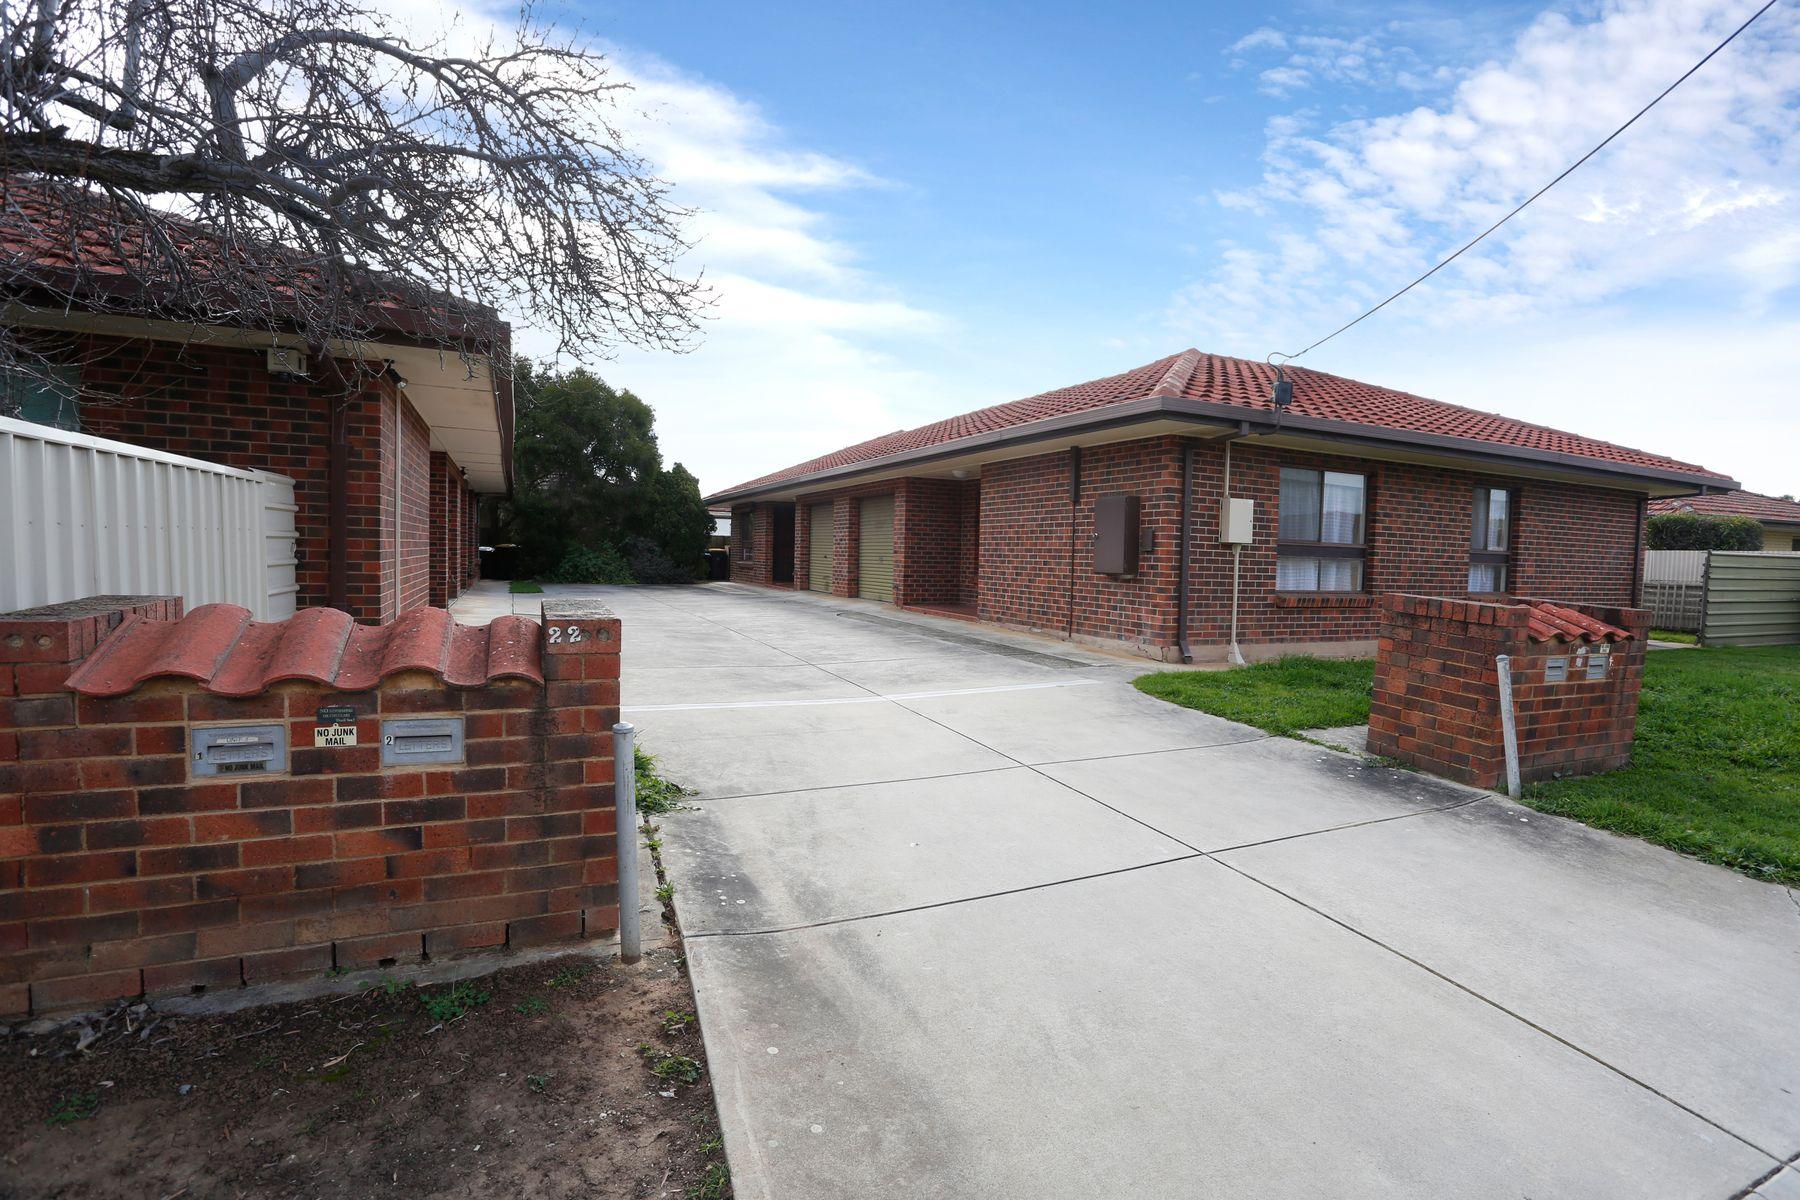 3/22 Chapel Street, Campbelltown, SA 5074